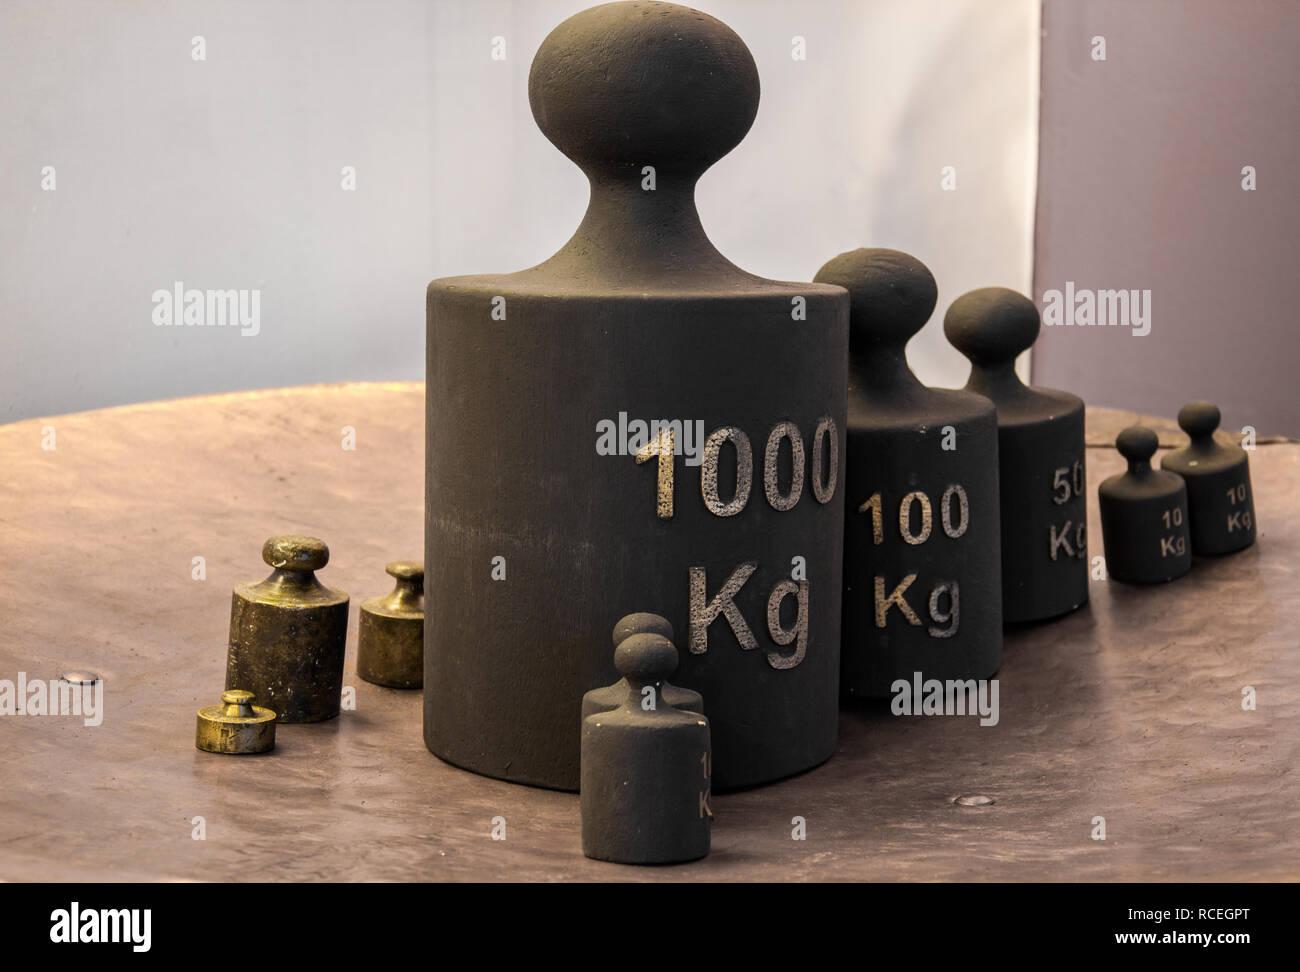 Old iron weight kilogram, measurement units - Stock Image